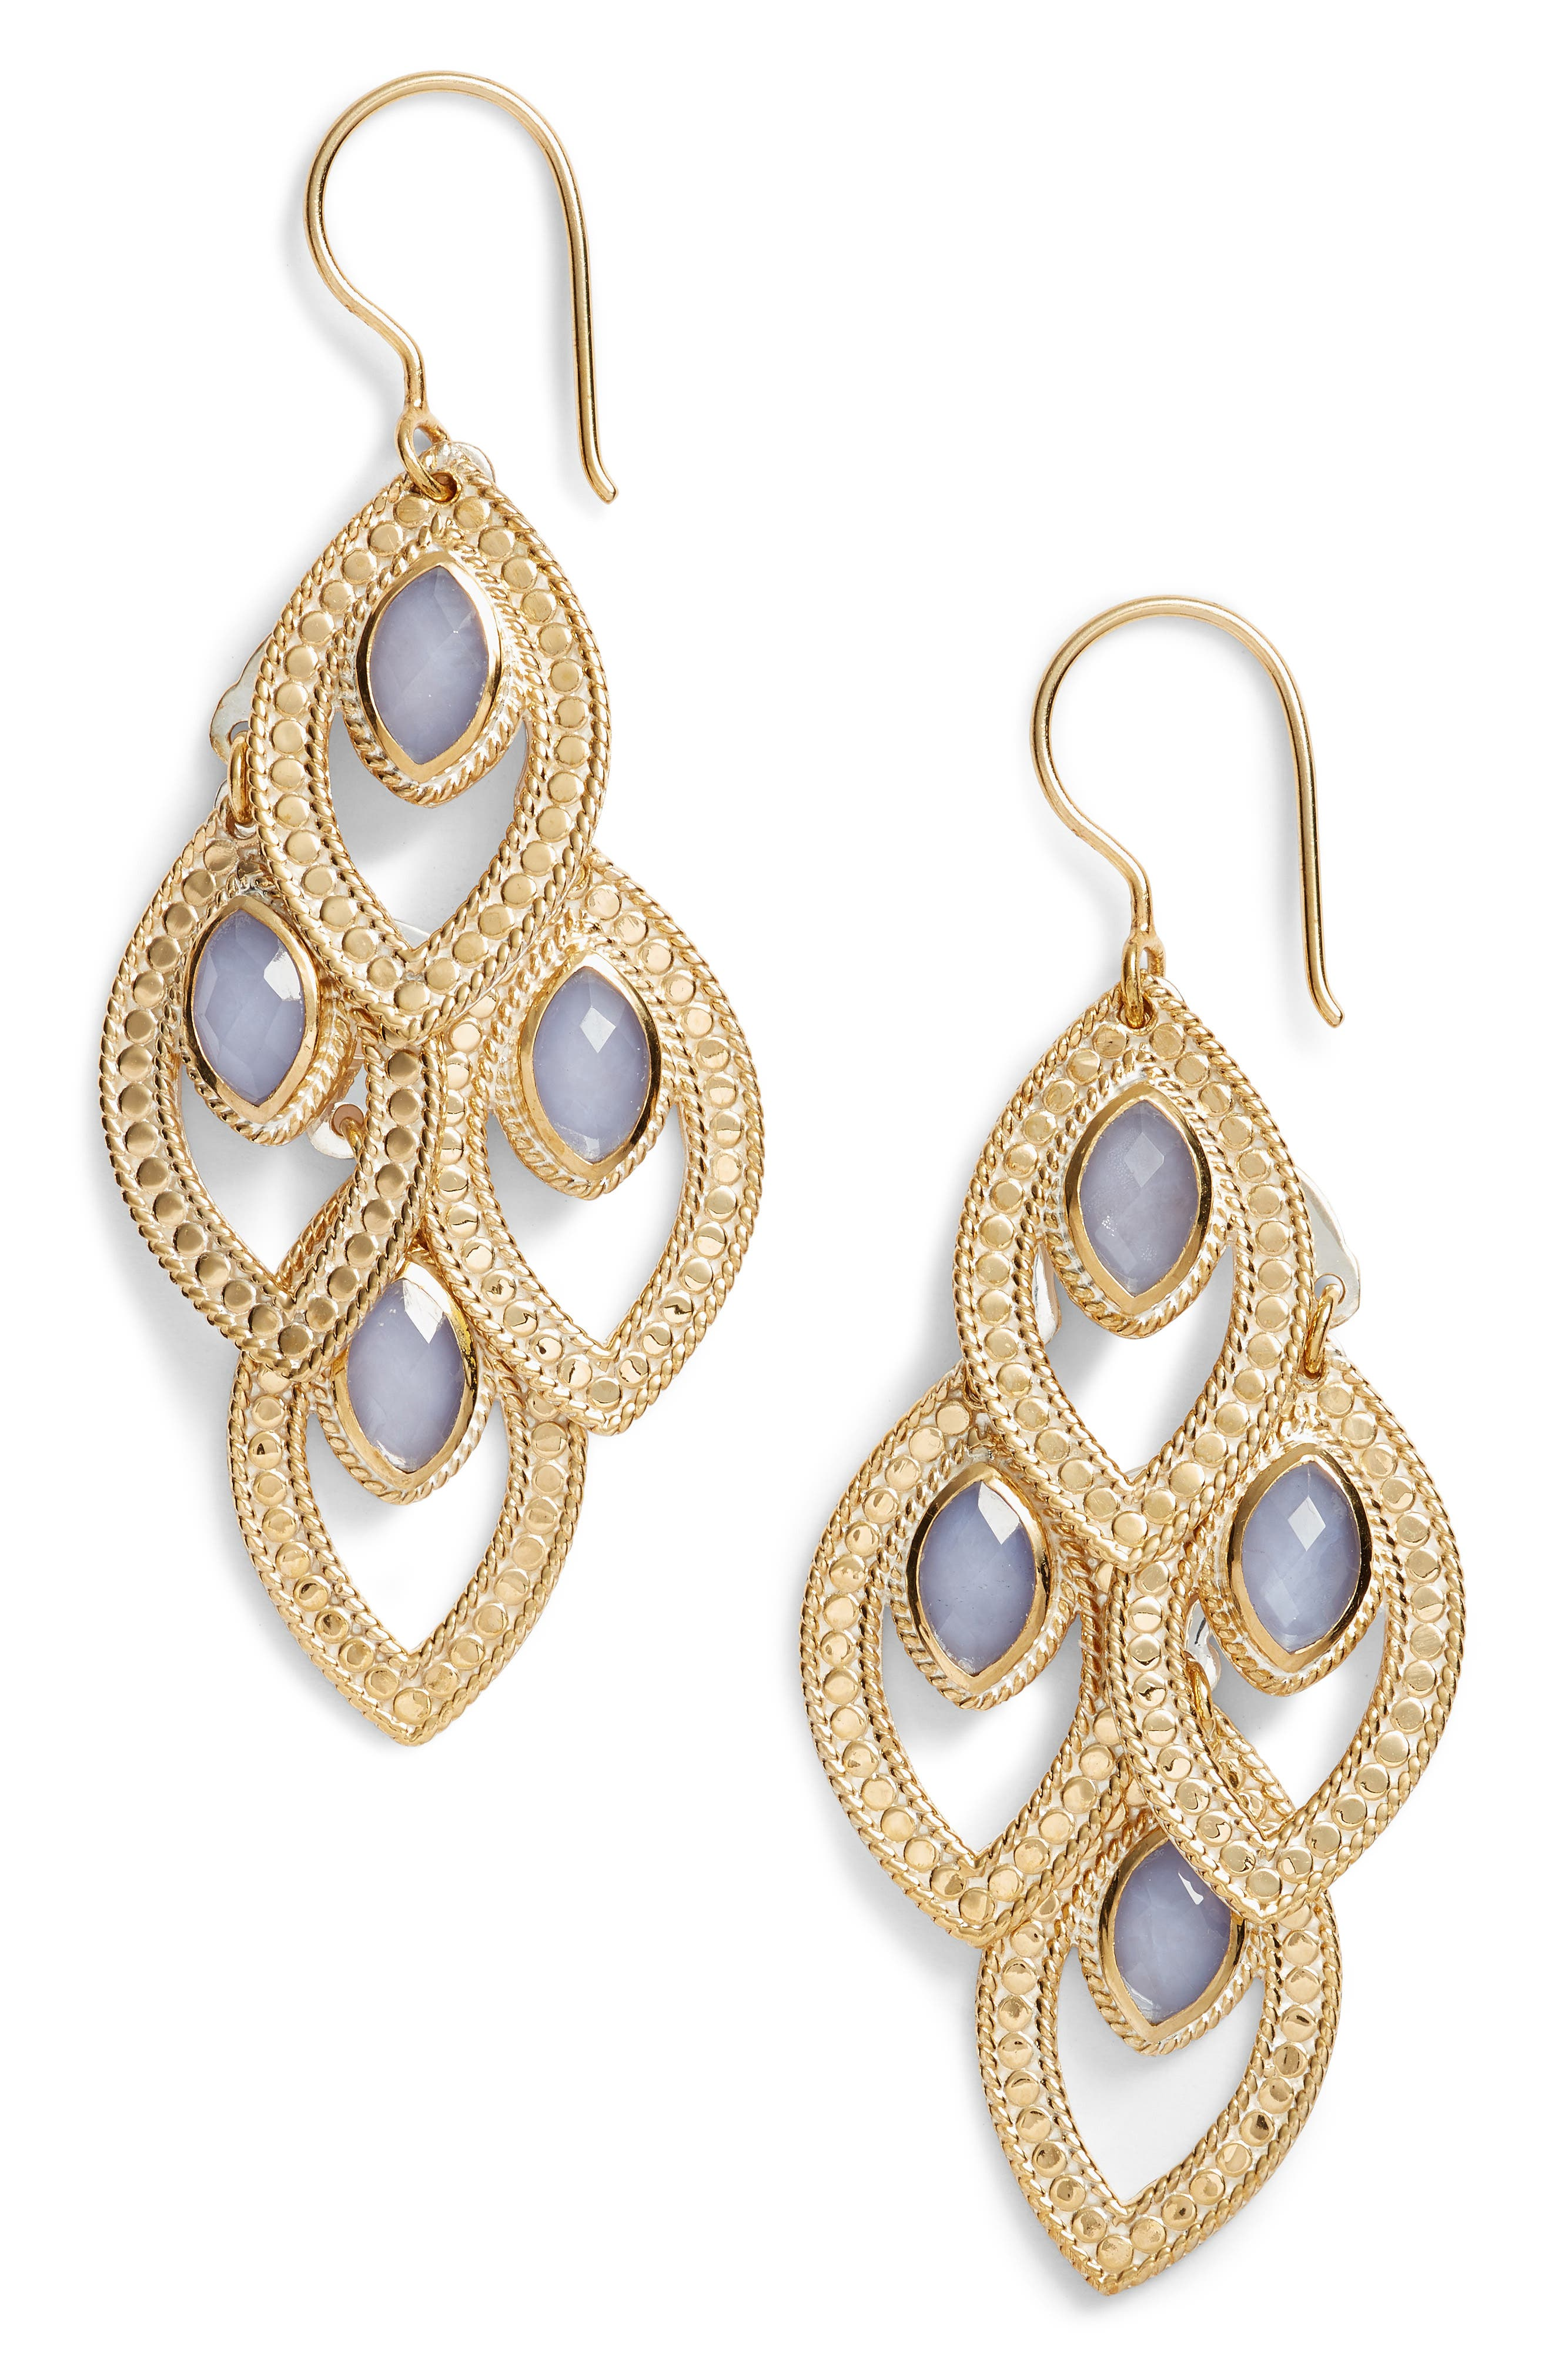 Chandelier Earrings,                         Main,                         color, Gold/ Blue Chalcedony